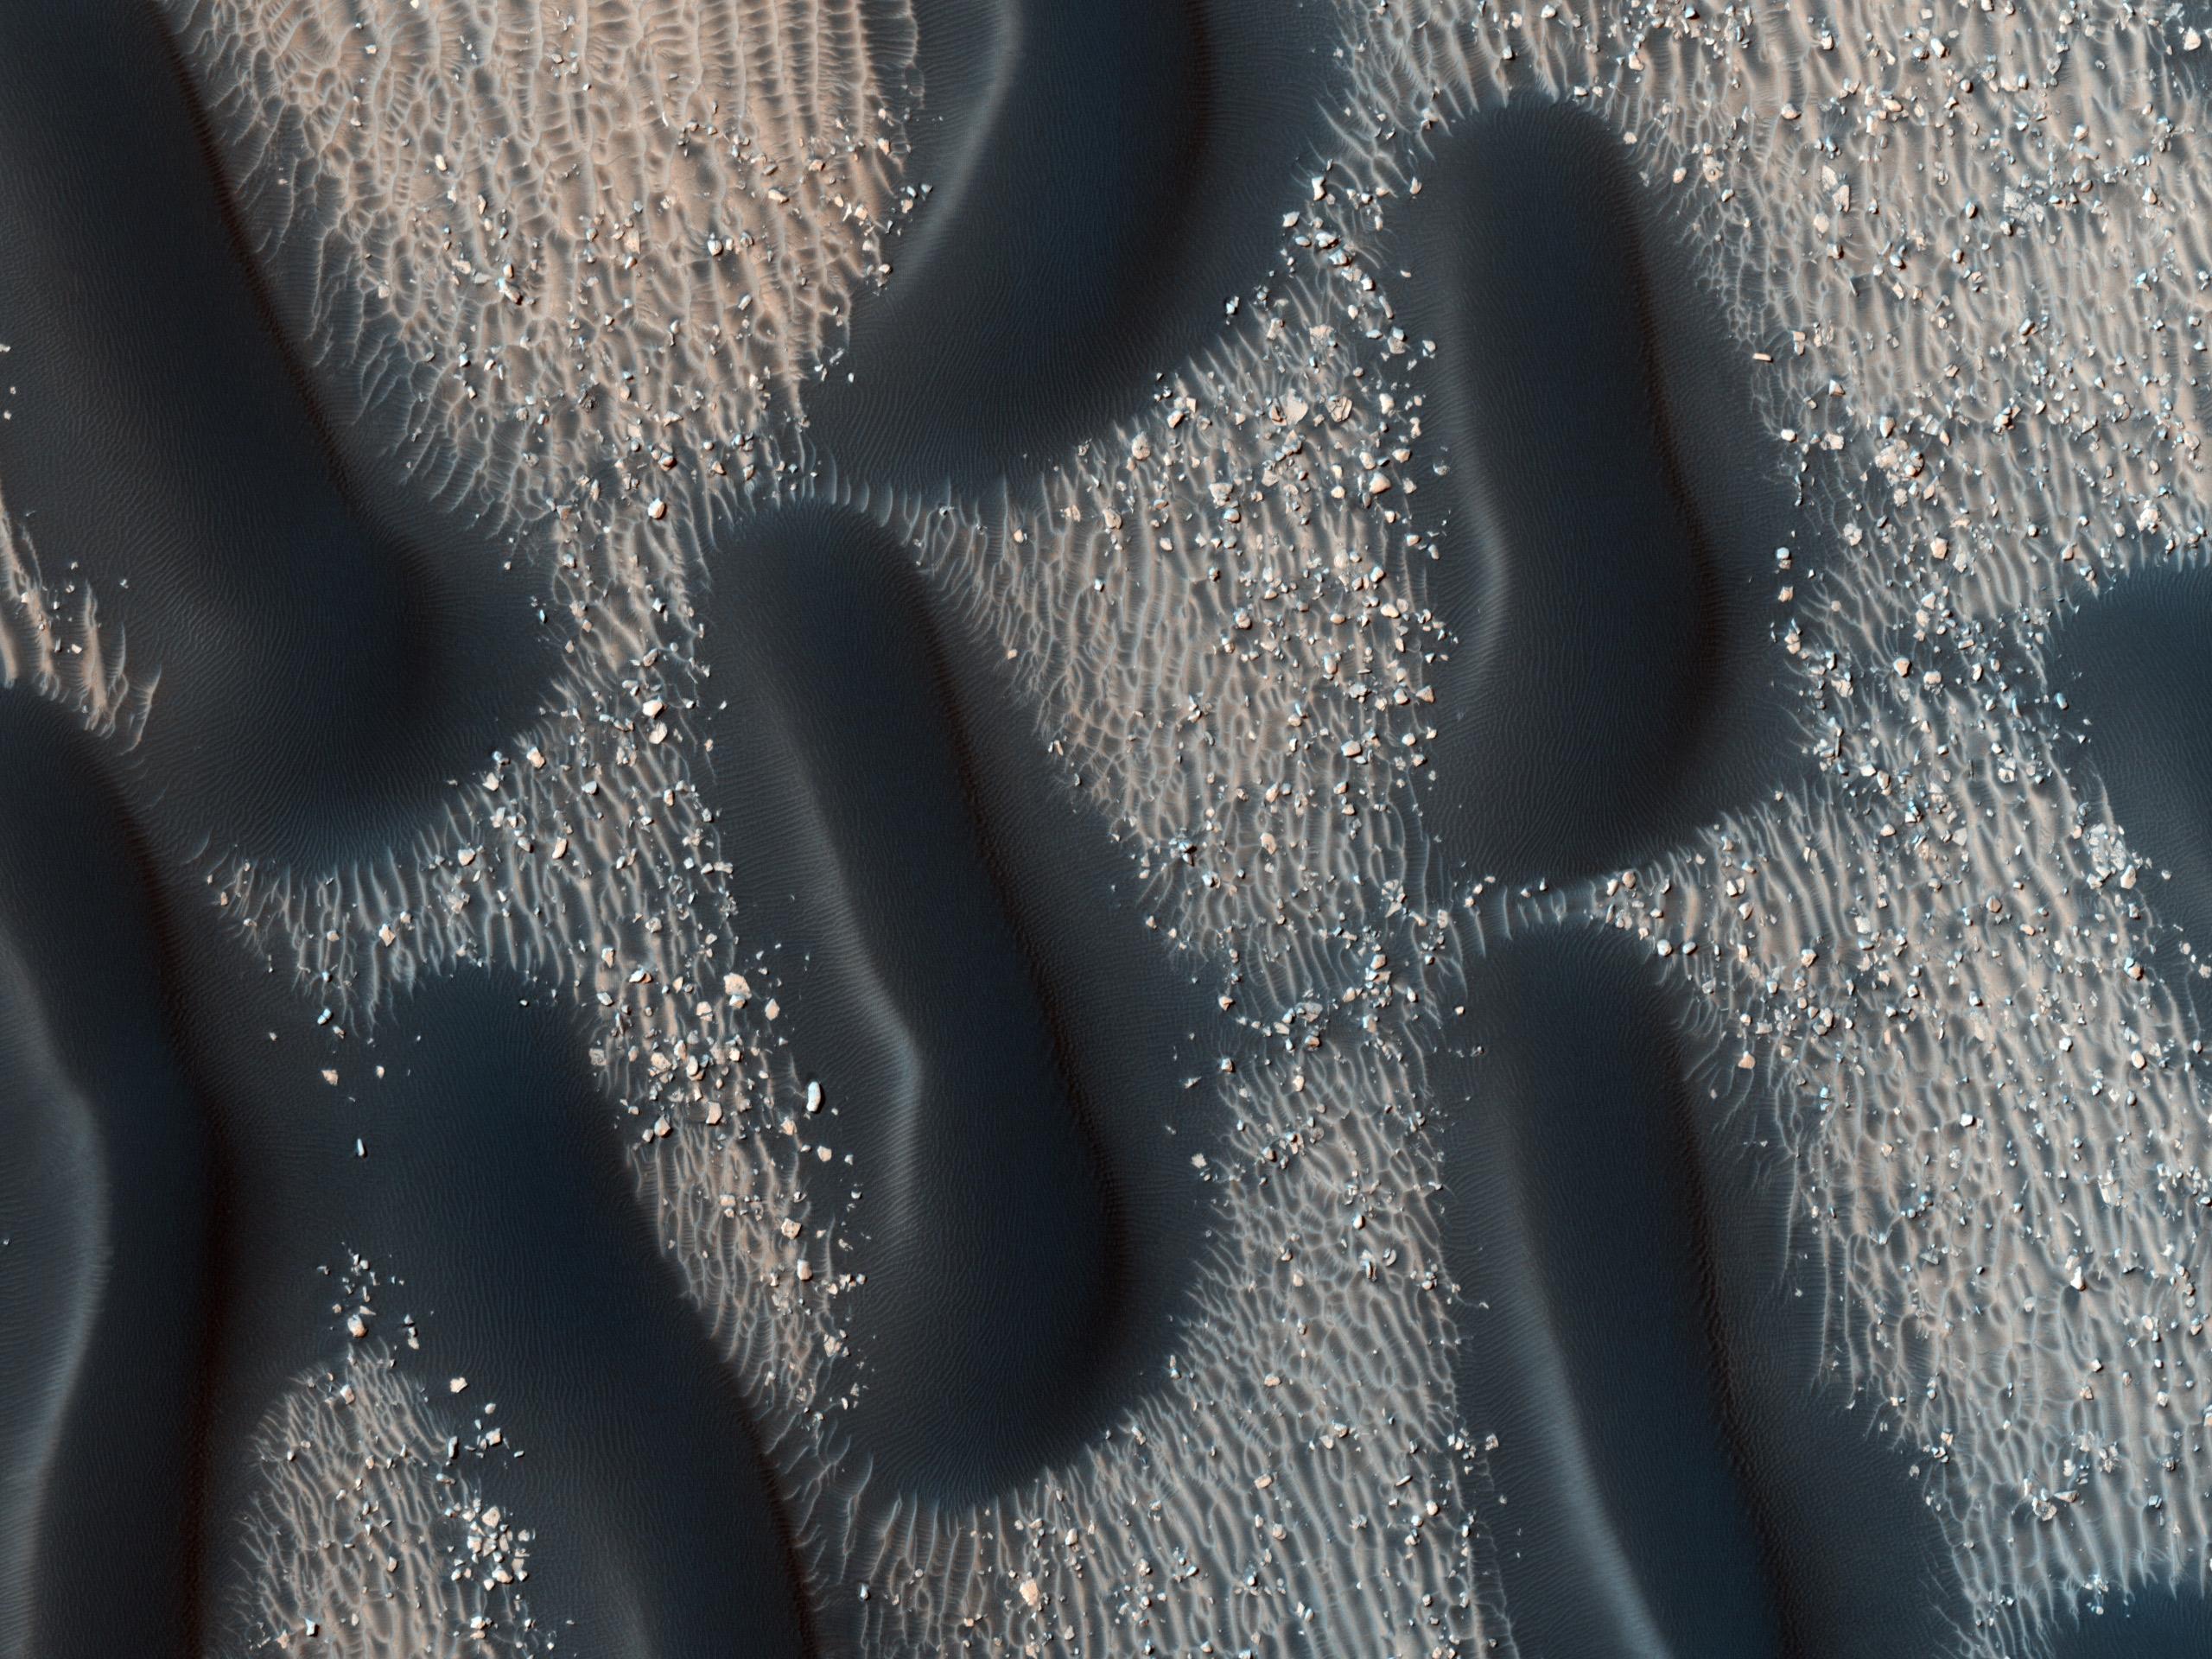 dunes-mars.jpg